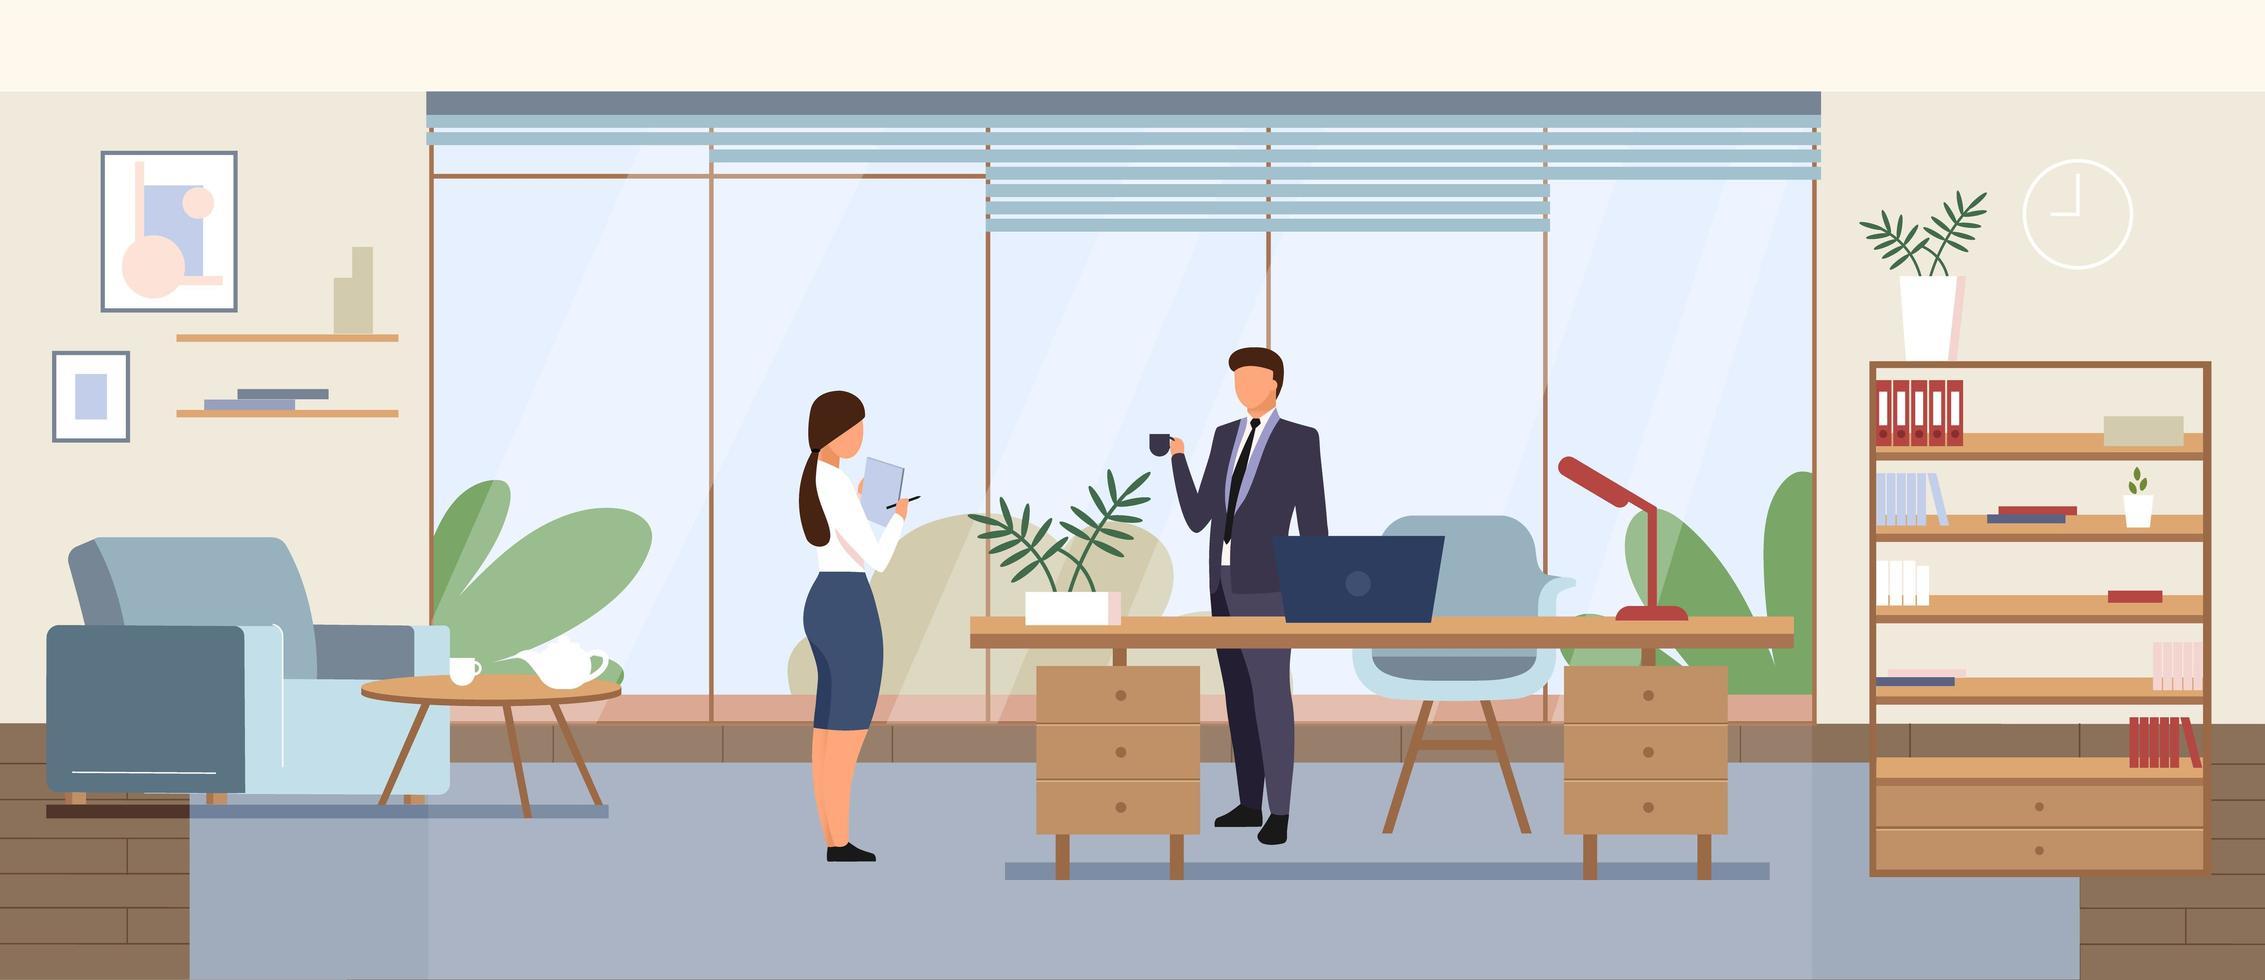 Business office vector illustration